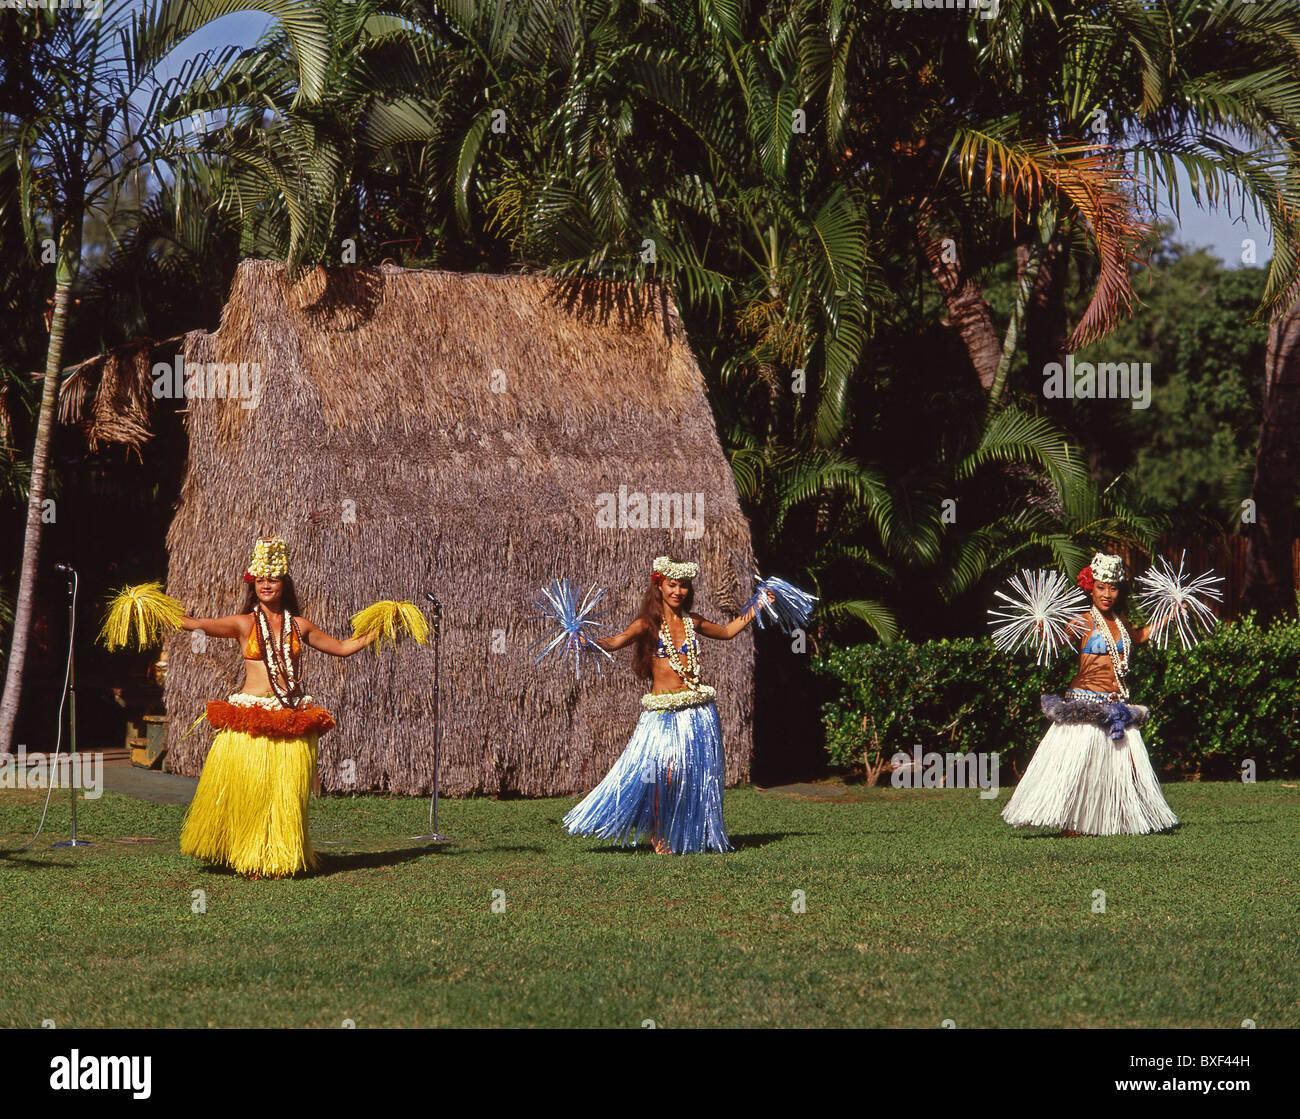 Hawaiian dancers, Kodak Hula Show, Honolulu, Oahu, Hawaii, United States of America - Stock Image